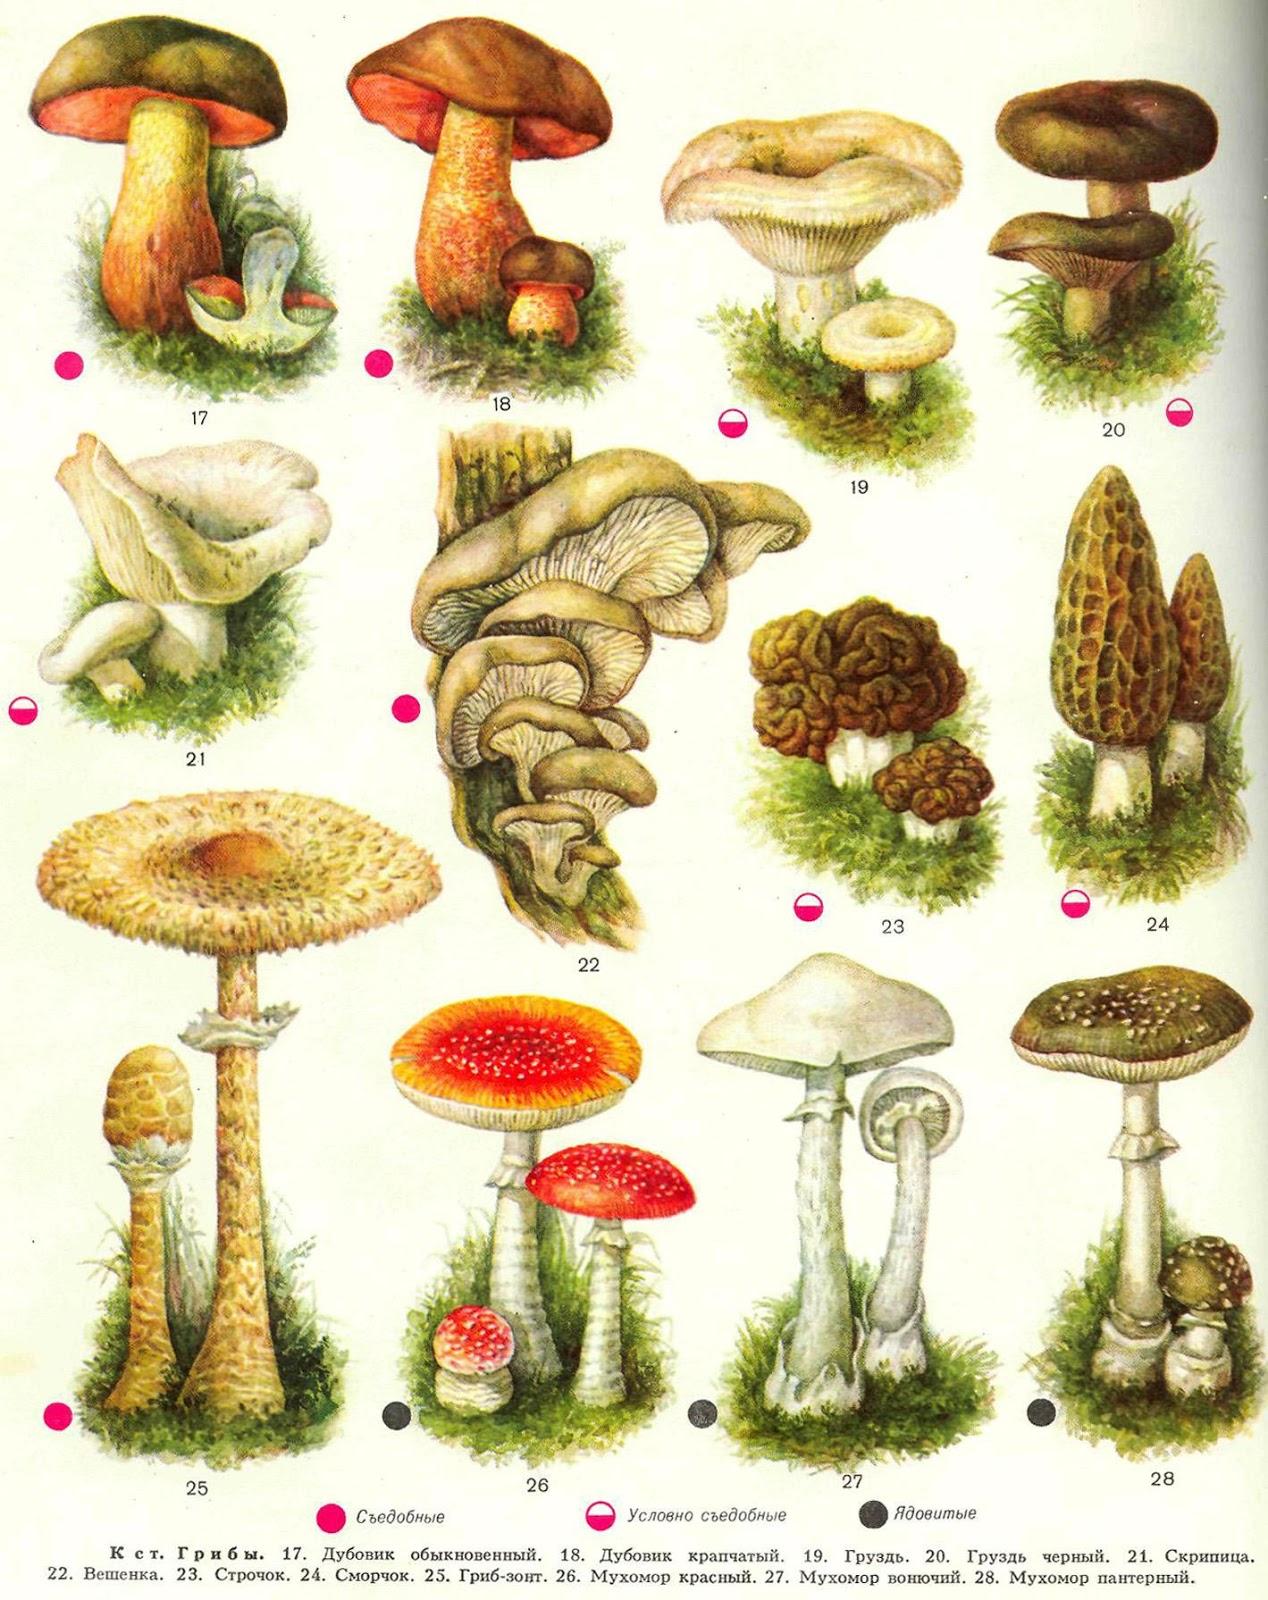 фото и названия всех грибов